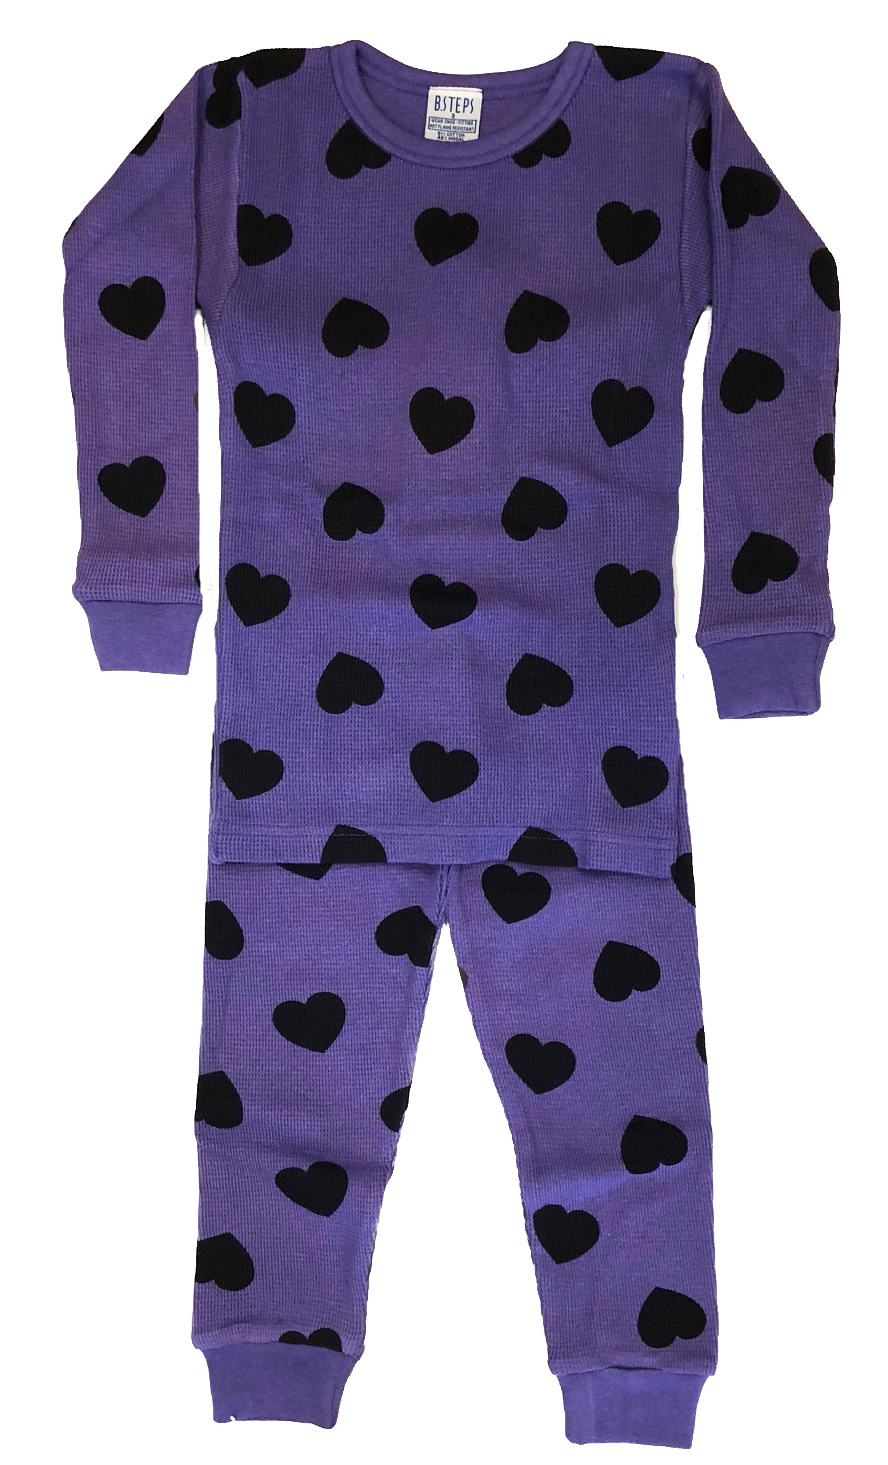 Baby Steps Grape Heart Thermal PJ Set